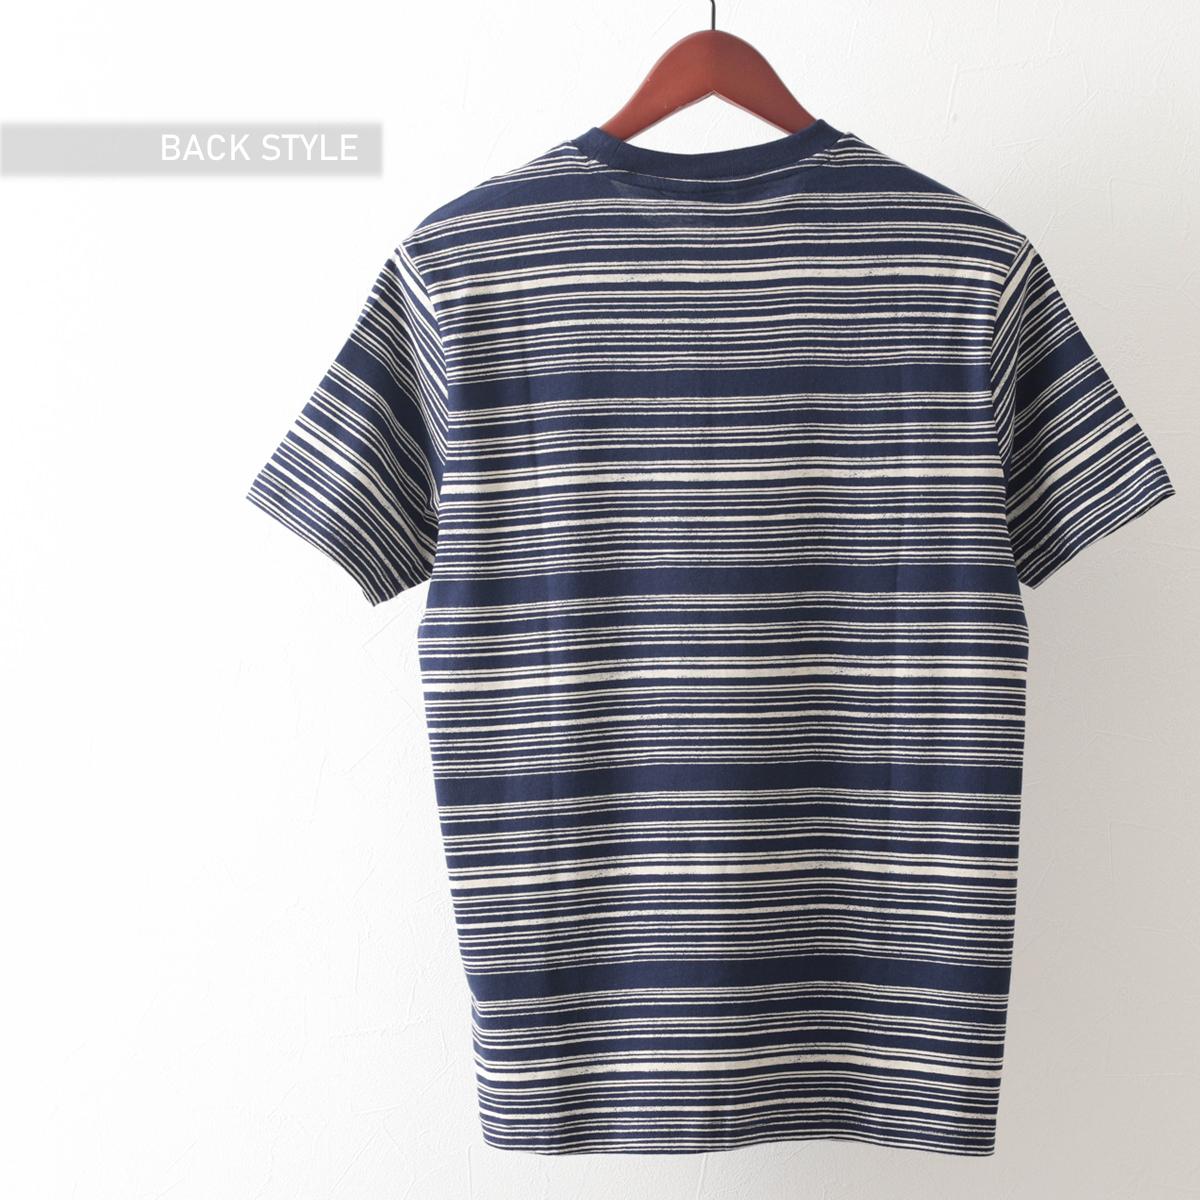 Tシャツ ストライプ 2色 オレンジ ネイビー レギュラーフィット Ben Sherman ベンシャーマン